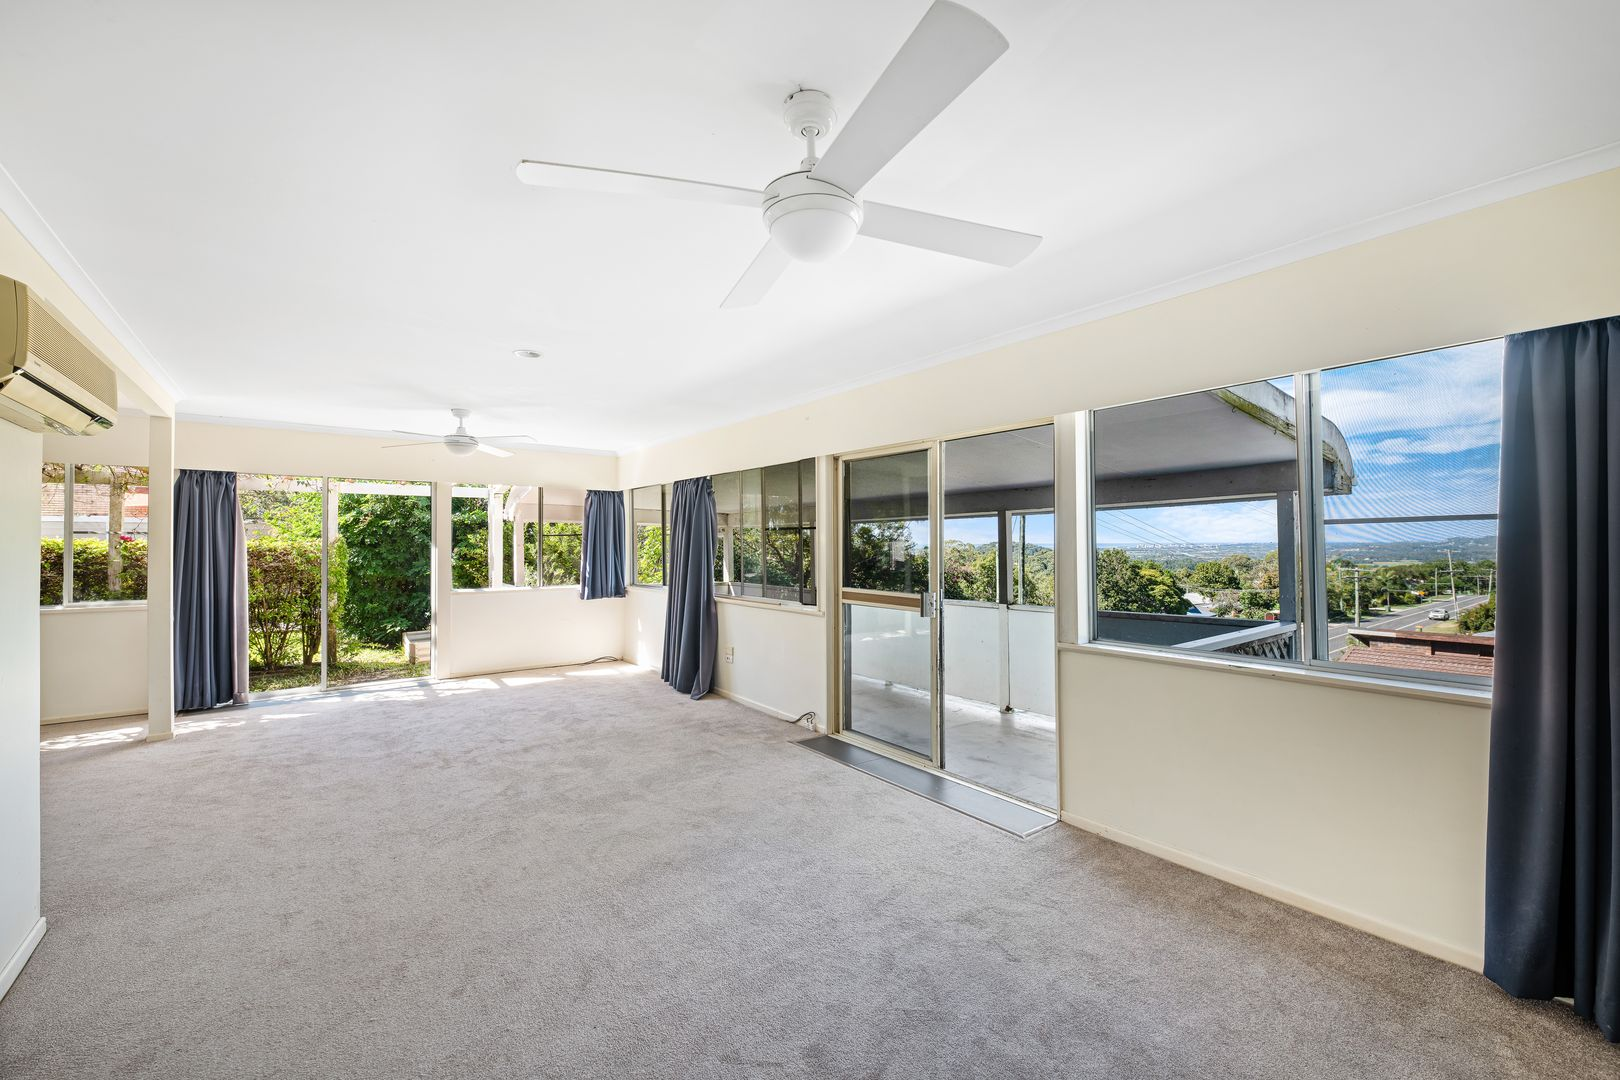 93 Atkinson Road, Bli Bli QLD 4560, Image 0